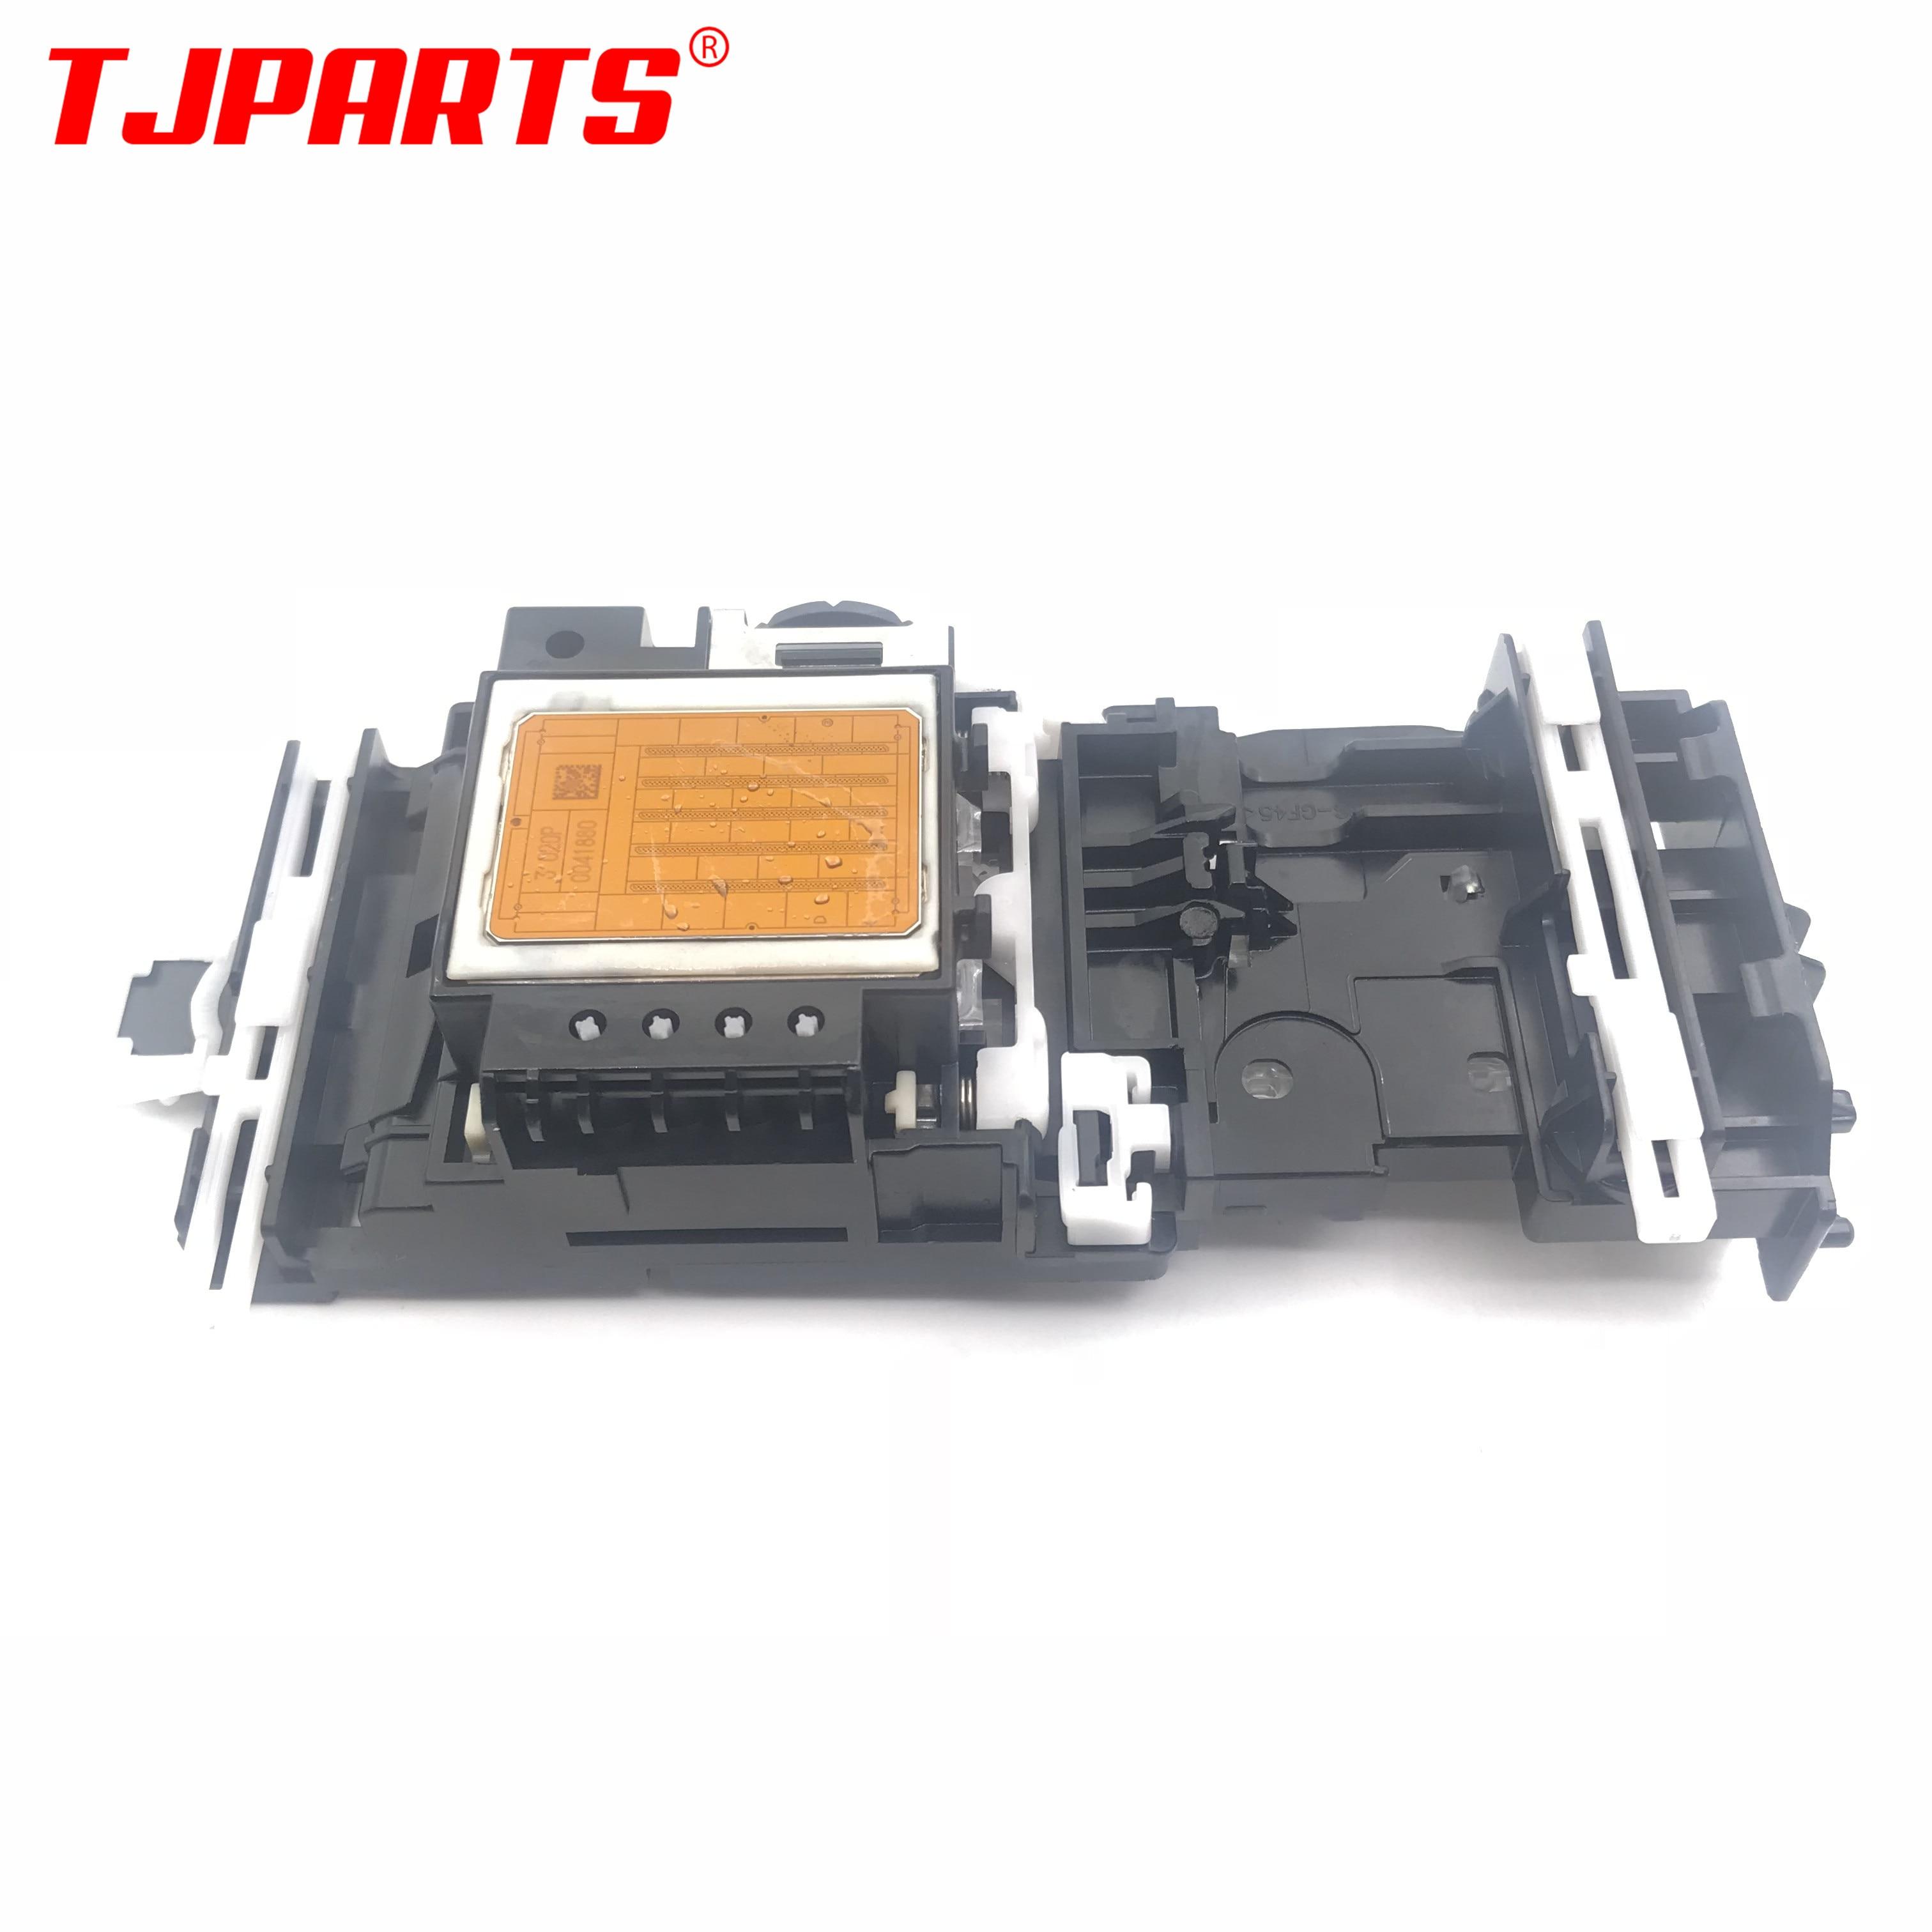 ORIGINAL LK3197001 990 A3 Printhead Print Head Printer Head For Brother MFC6490 MFC6490CW MFC5890 MFC6690 MFC6890 MFC5895CW